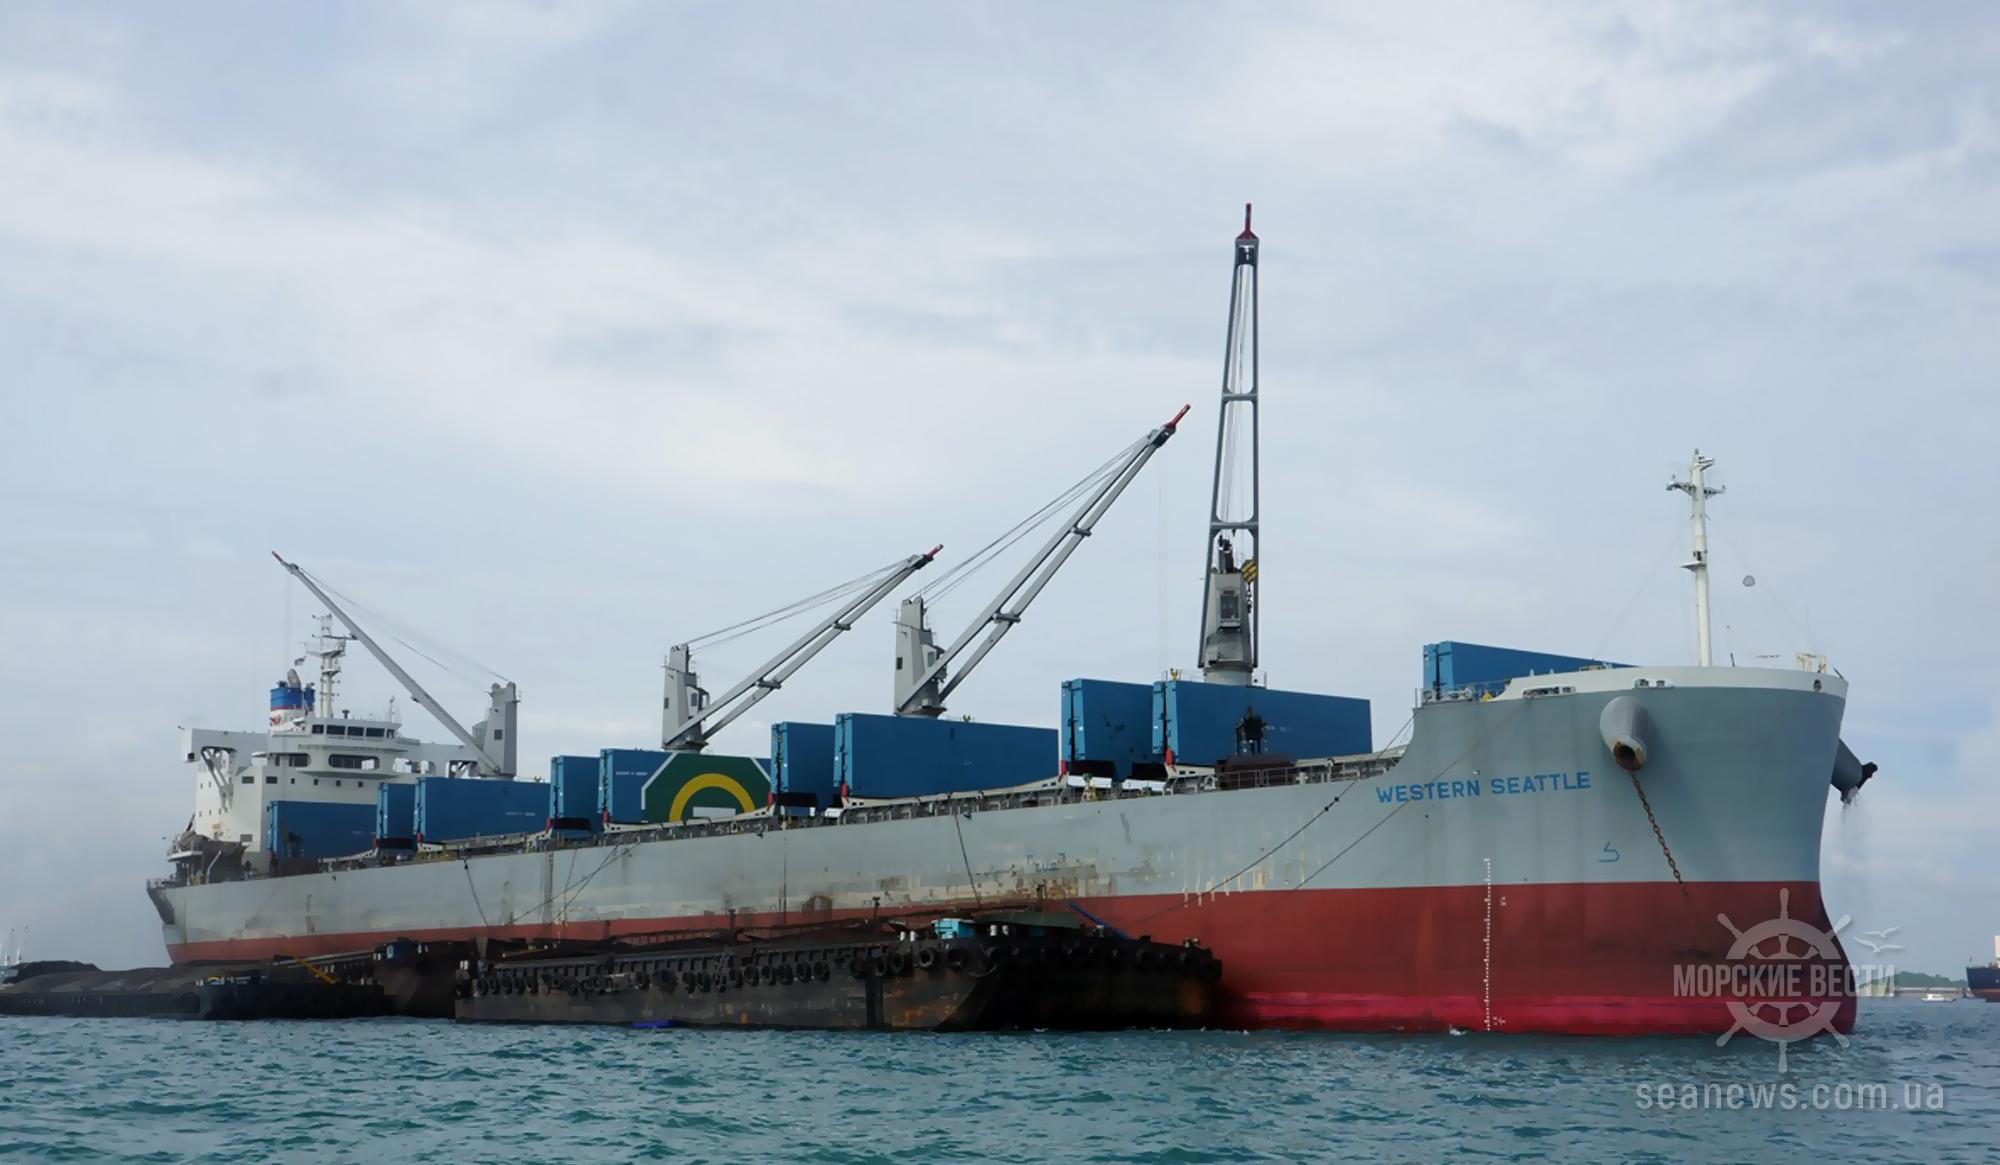 Пираты напали на судно Western Seattle